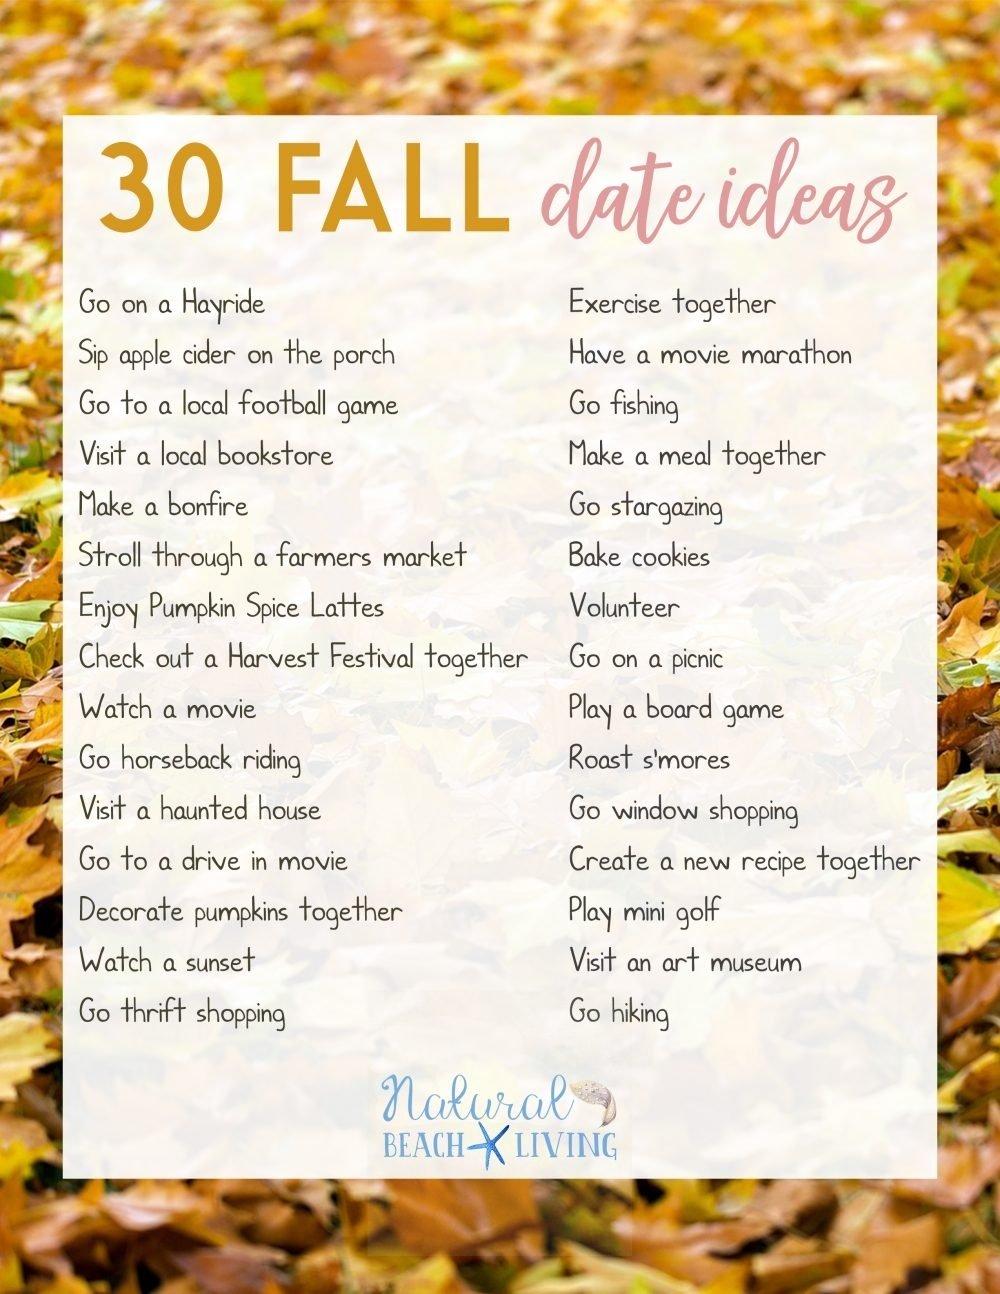 fun dates to go on